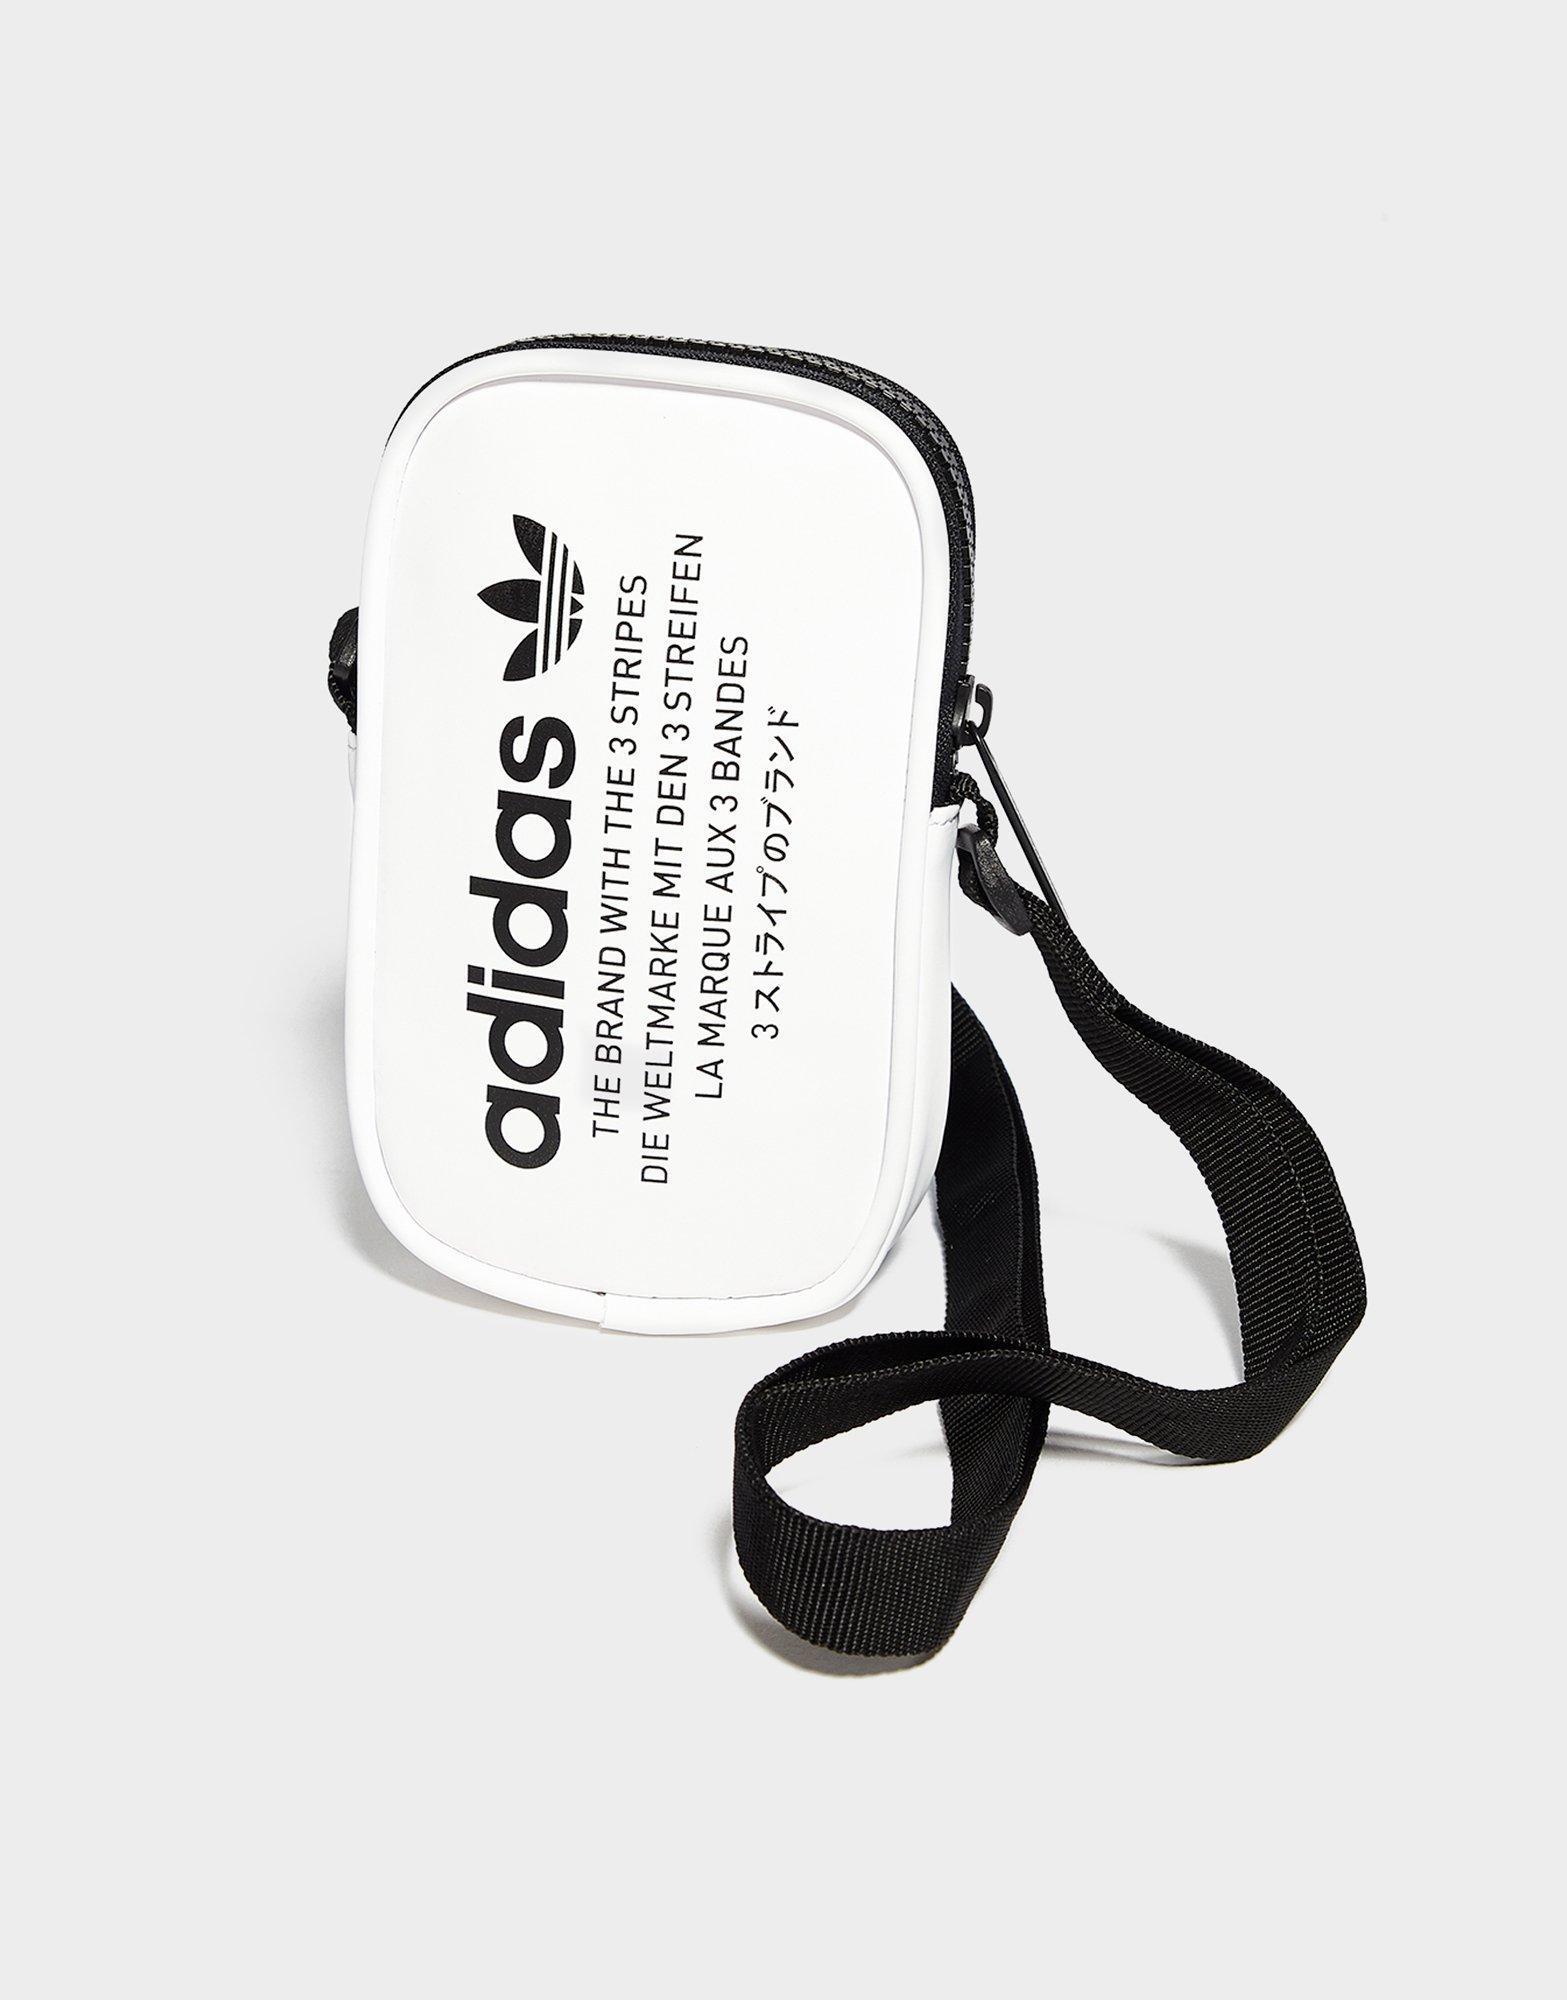 37a61ba25e8c6 Lyst - adidas Originals Nmd Festival Bag in Black for Men